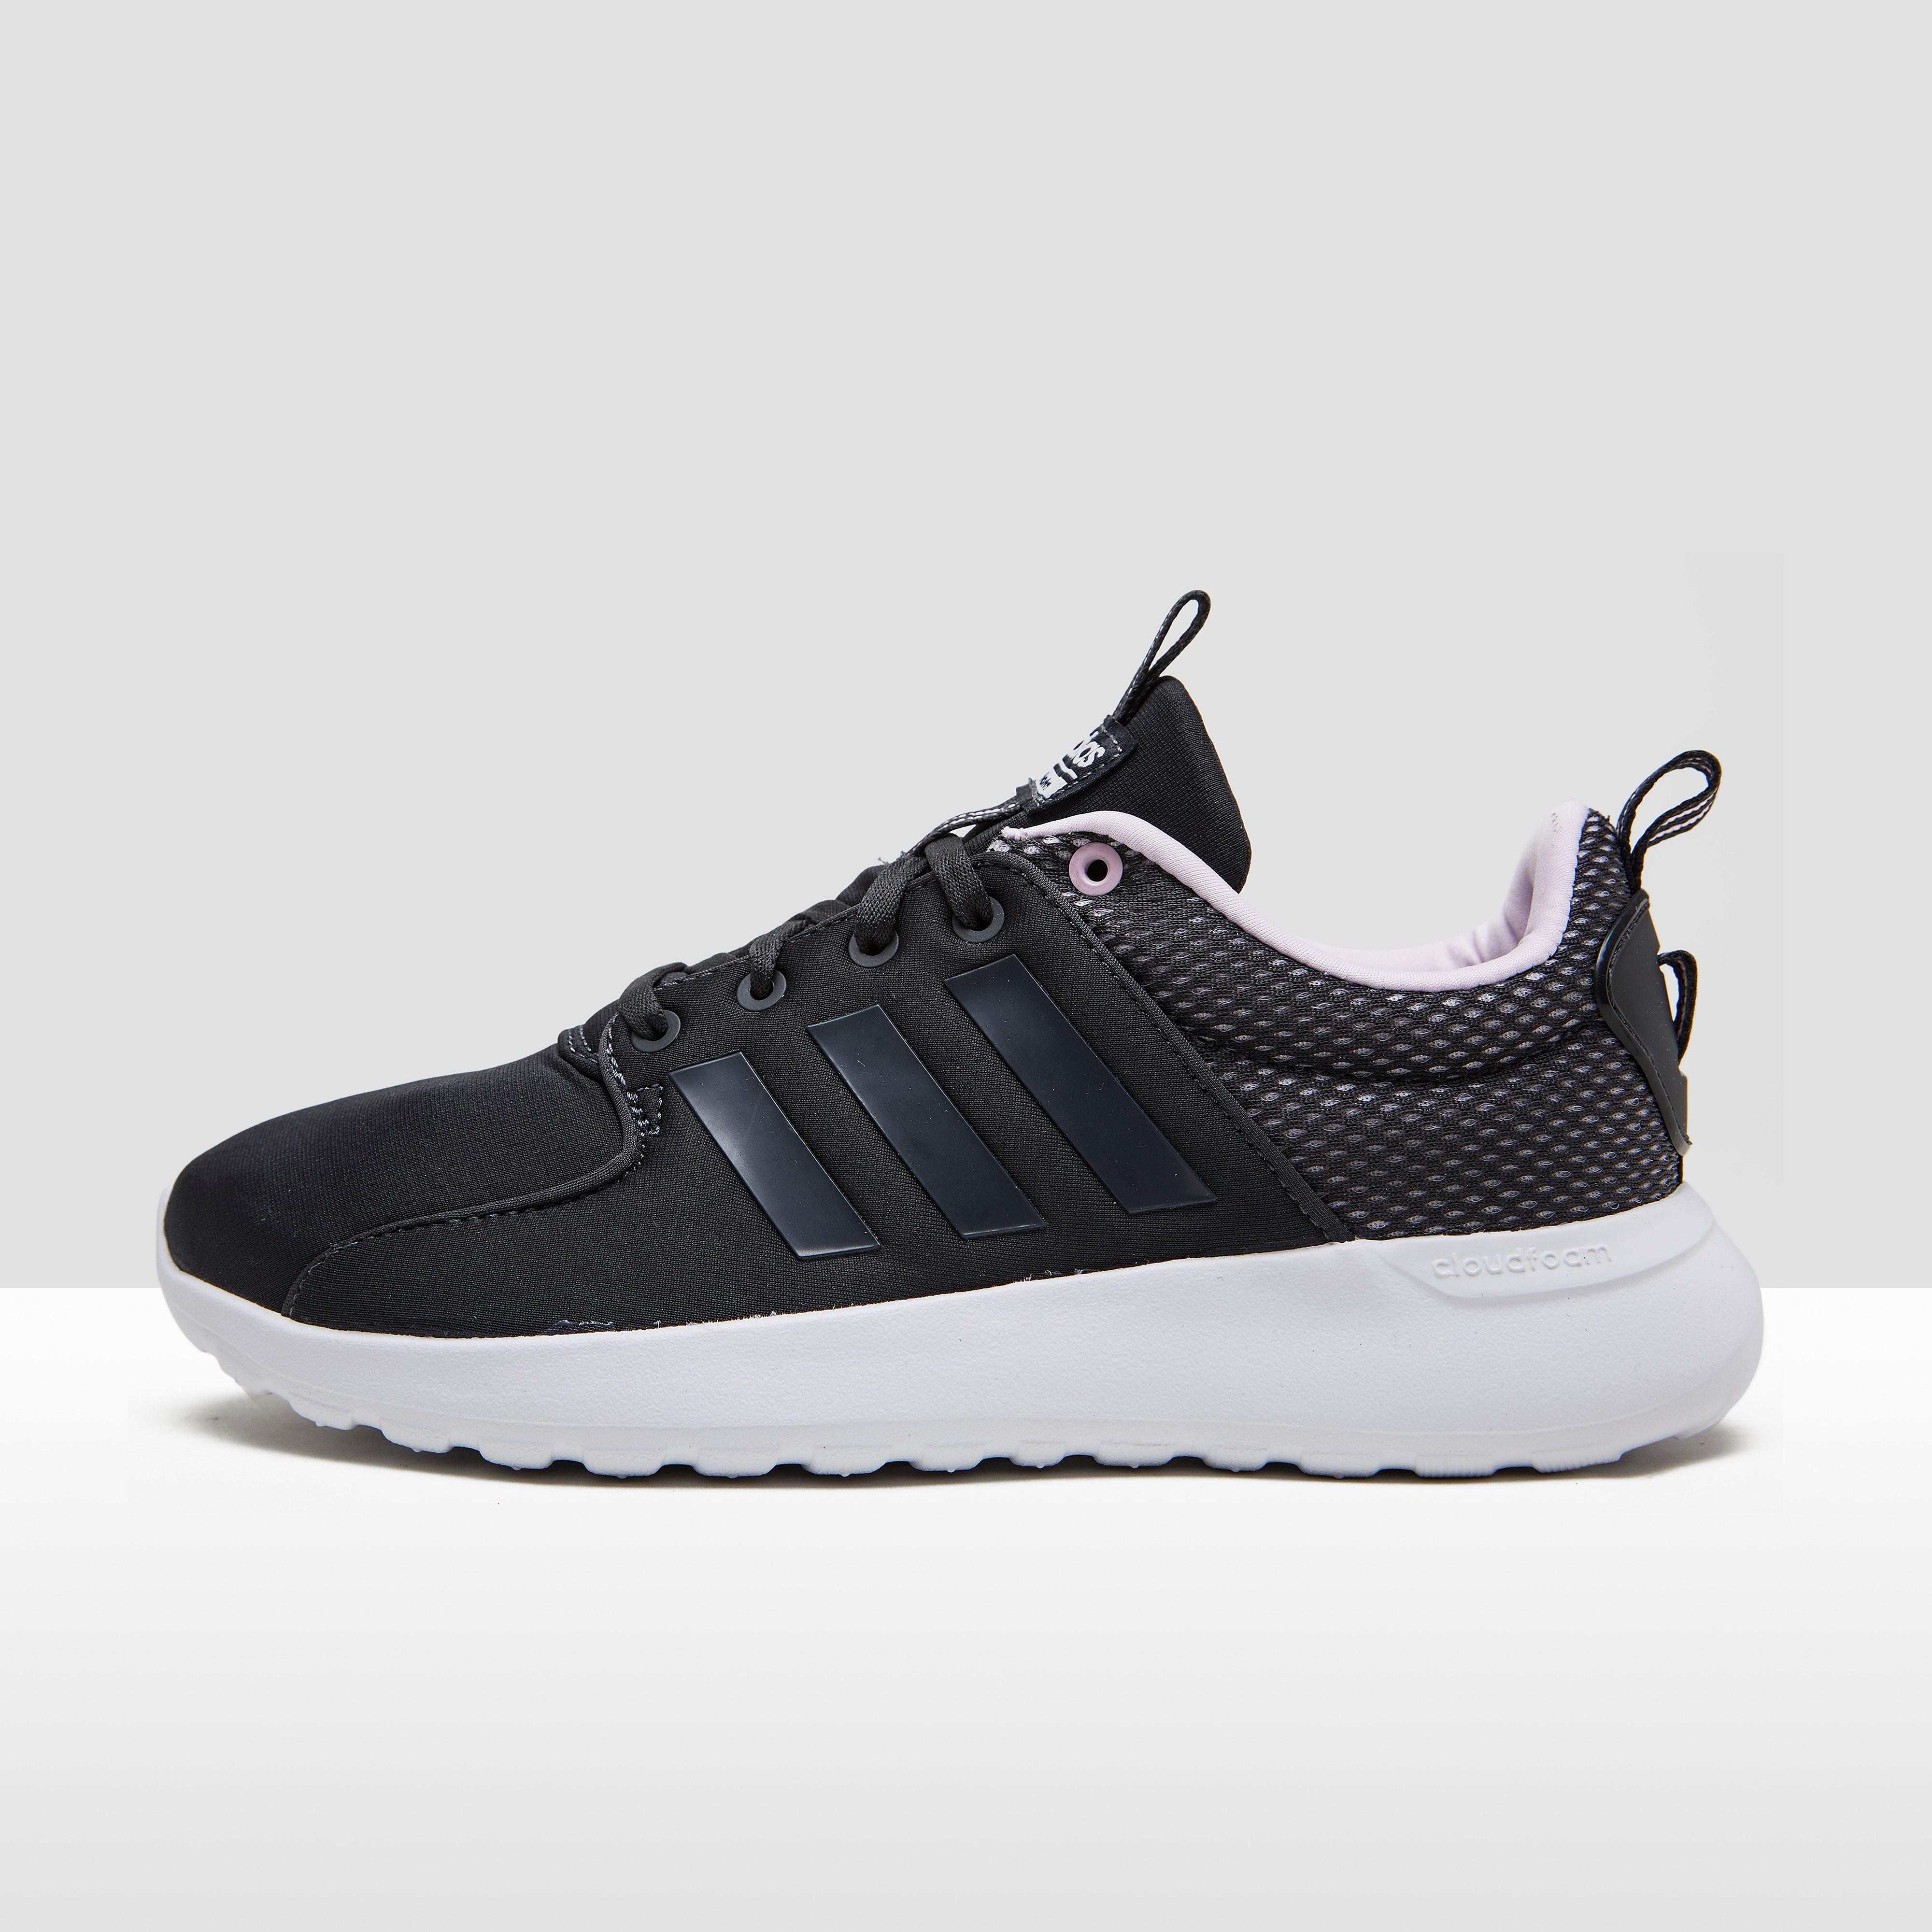 Womens Cloudfoam Lite Racer Sneakers Zwart Dames. Size 42